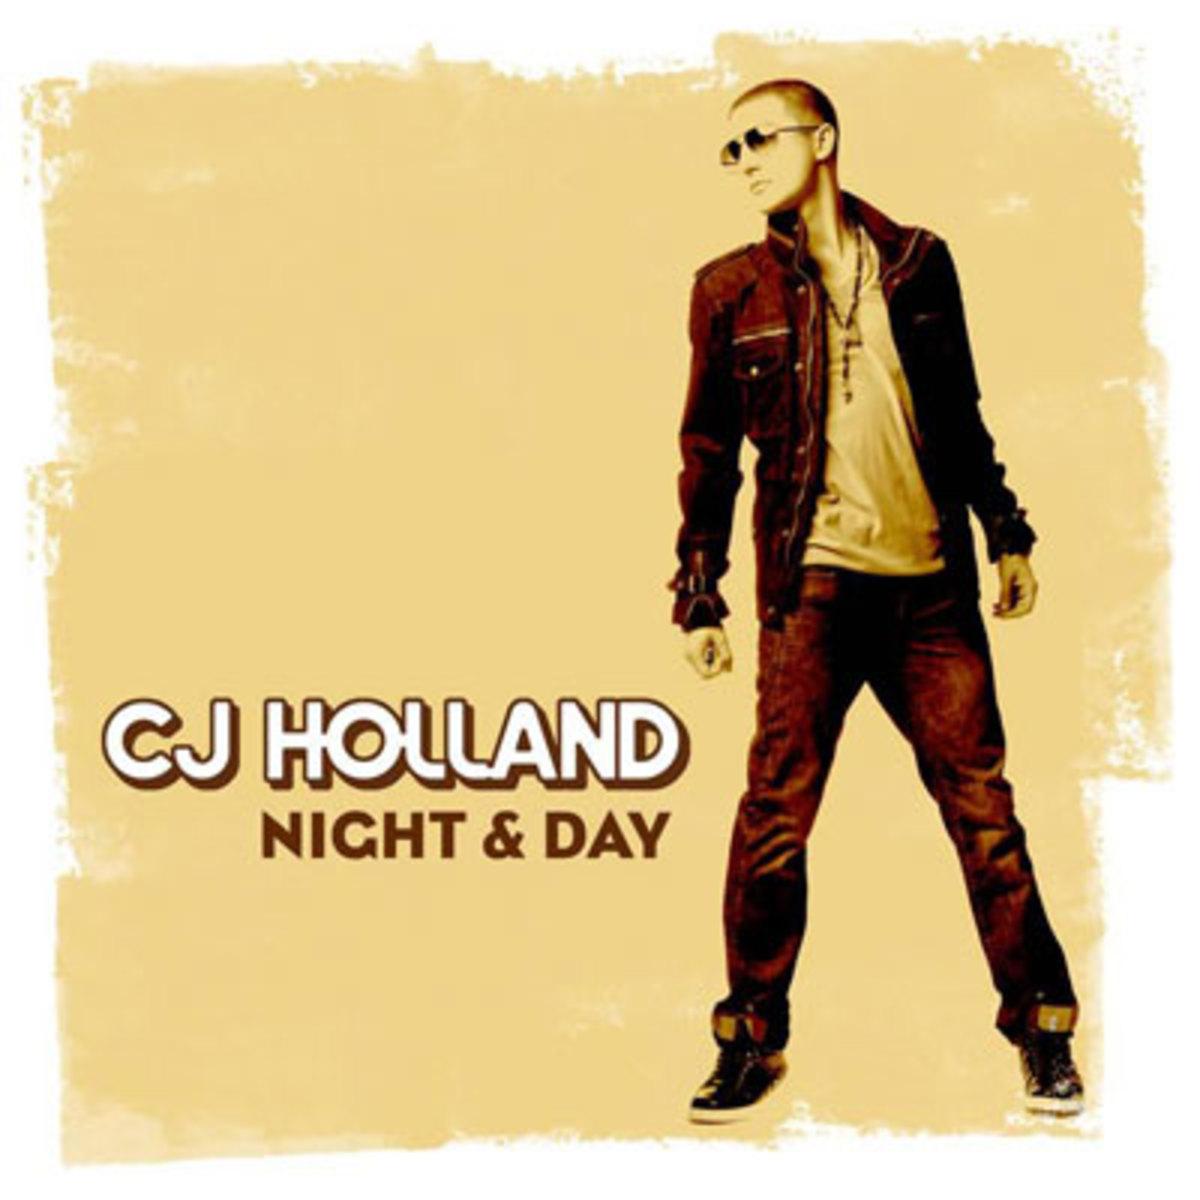 cj-holland-night-and-day.jpg